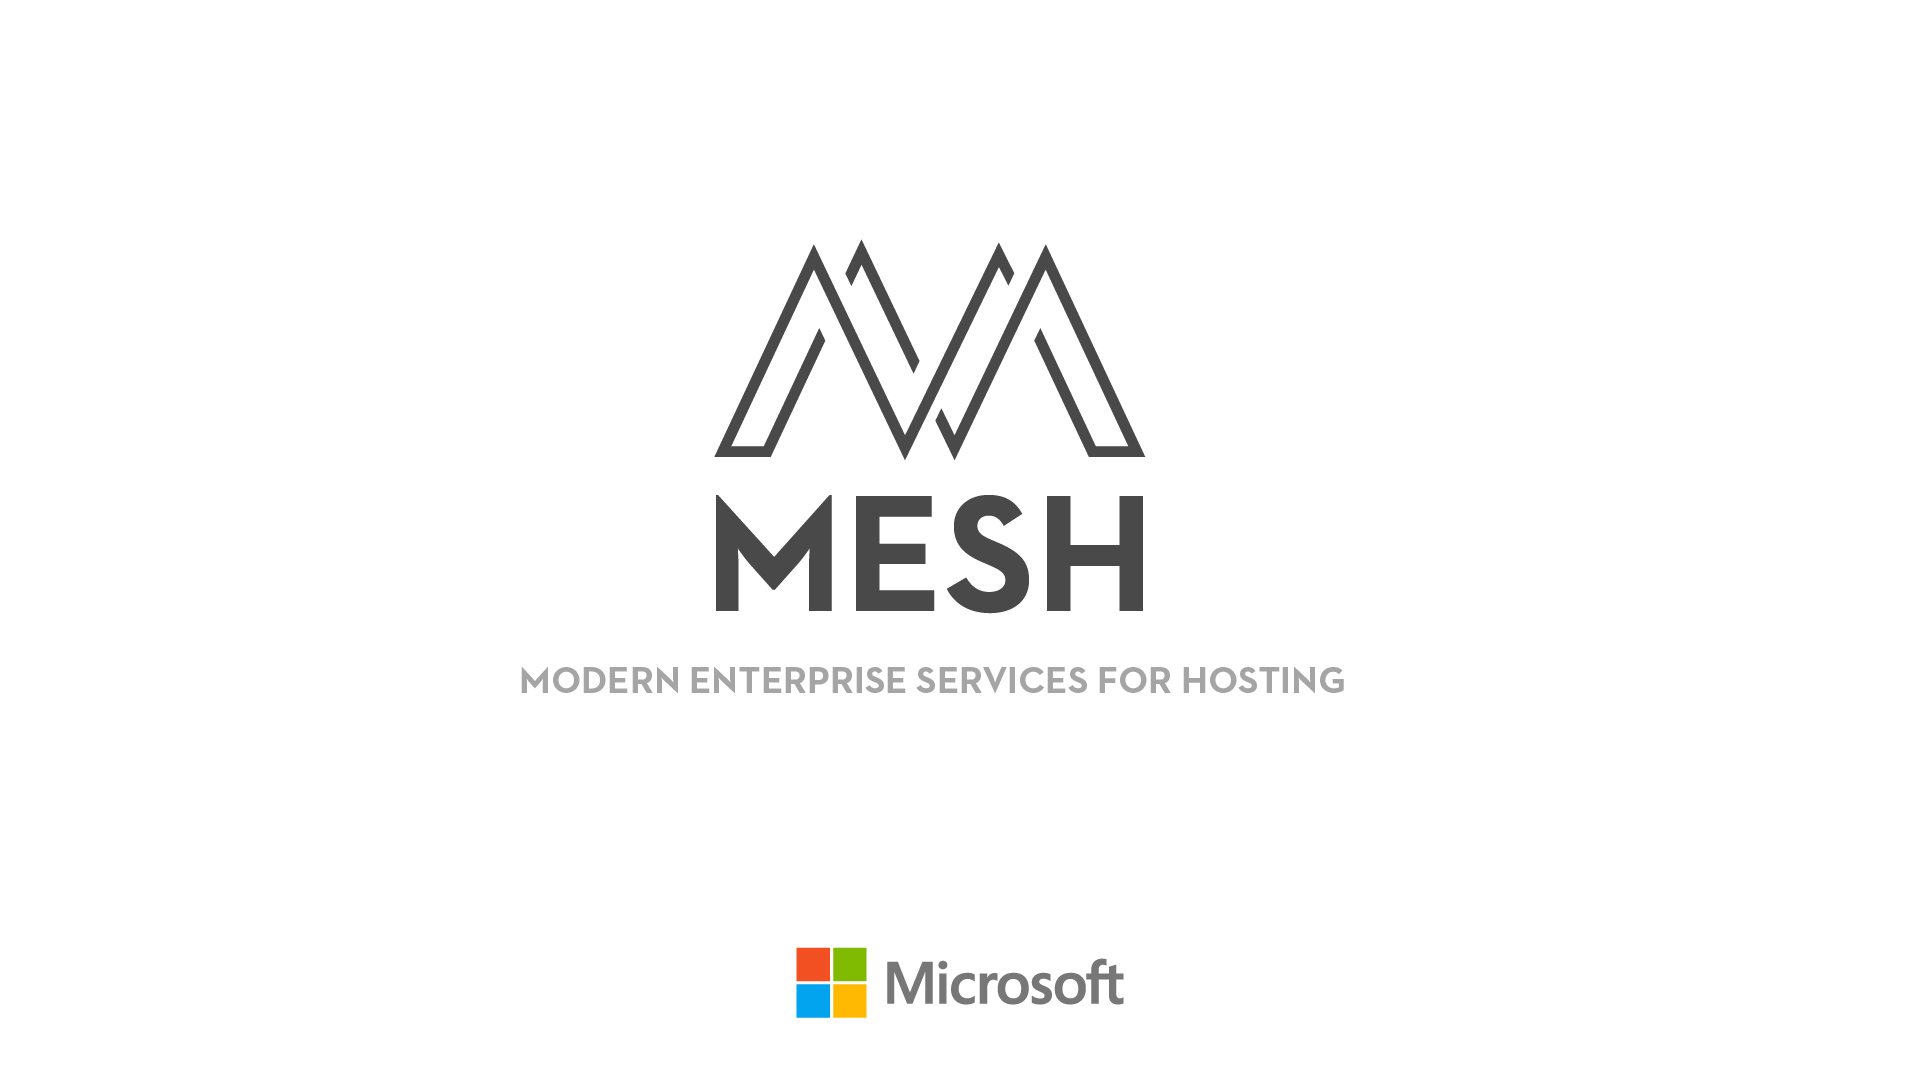 mesh01a.jpg